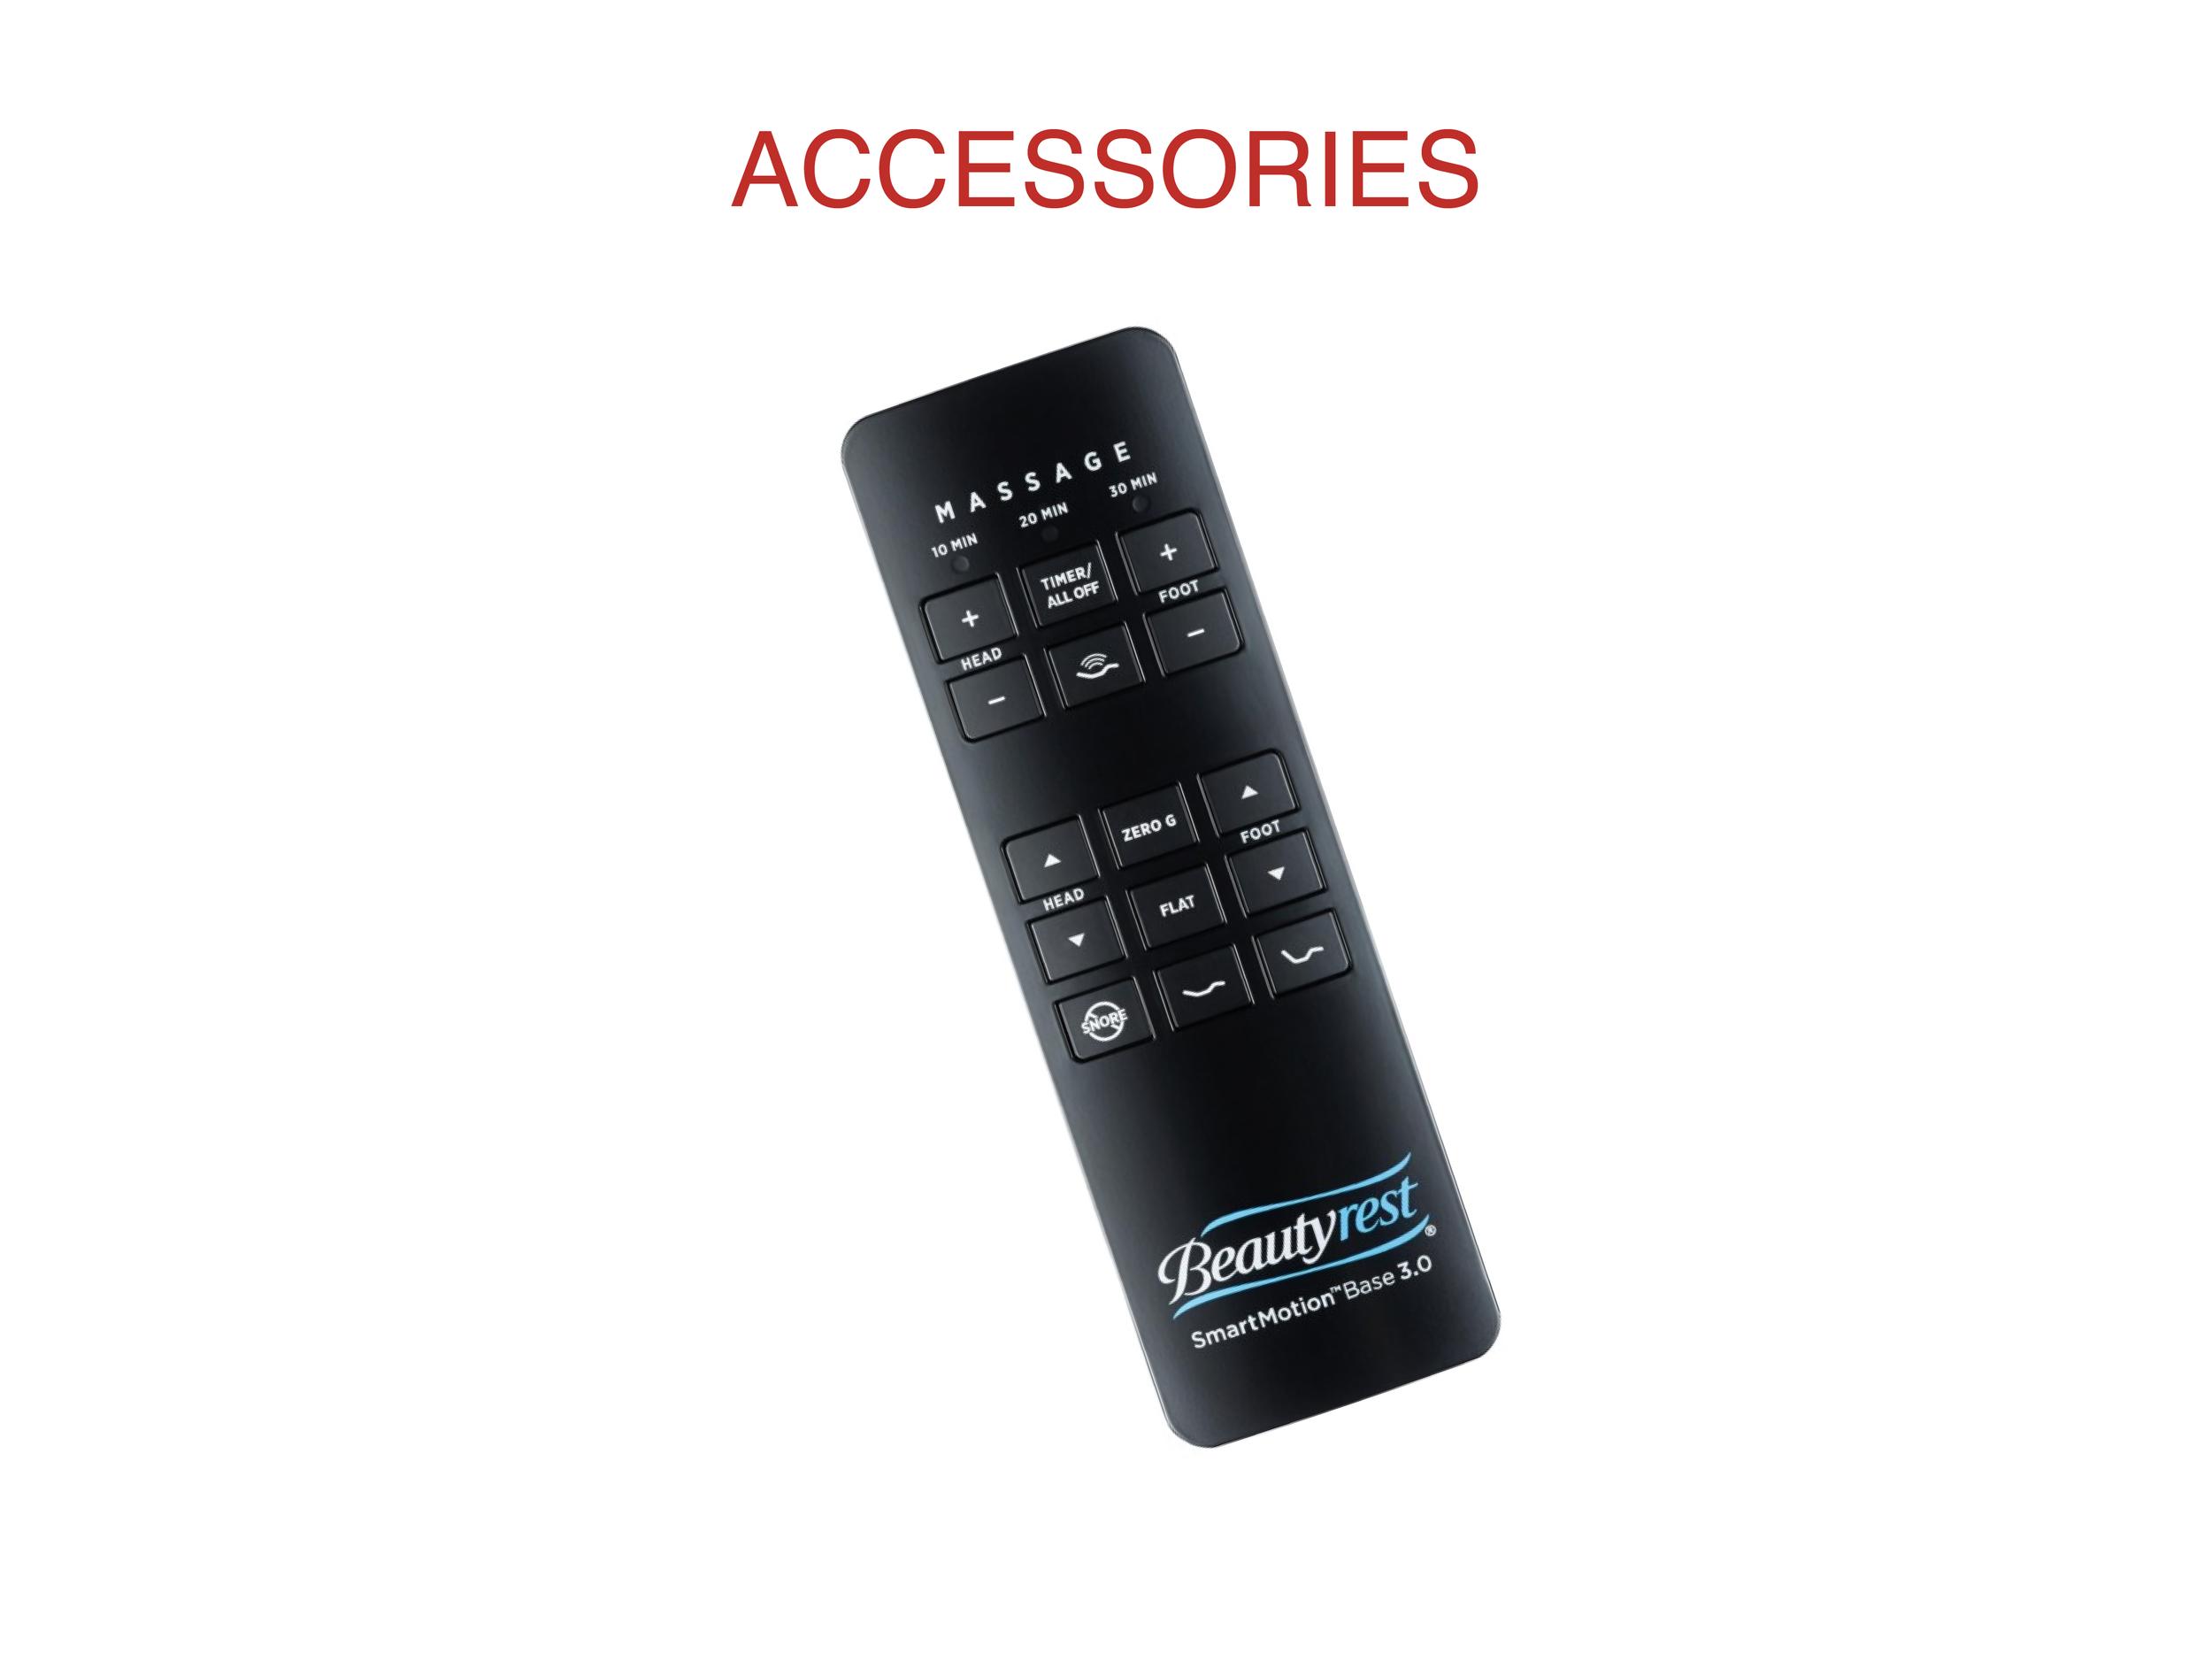 Accessories Link